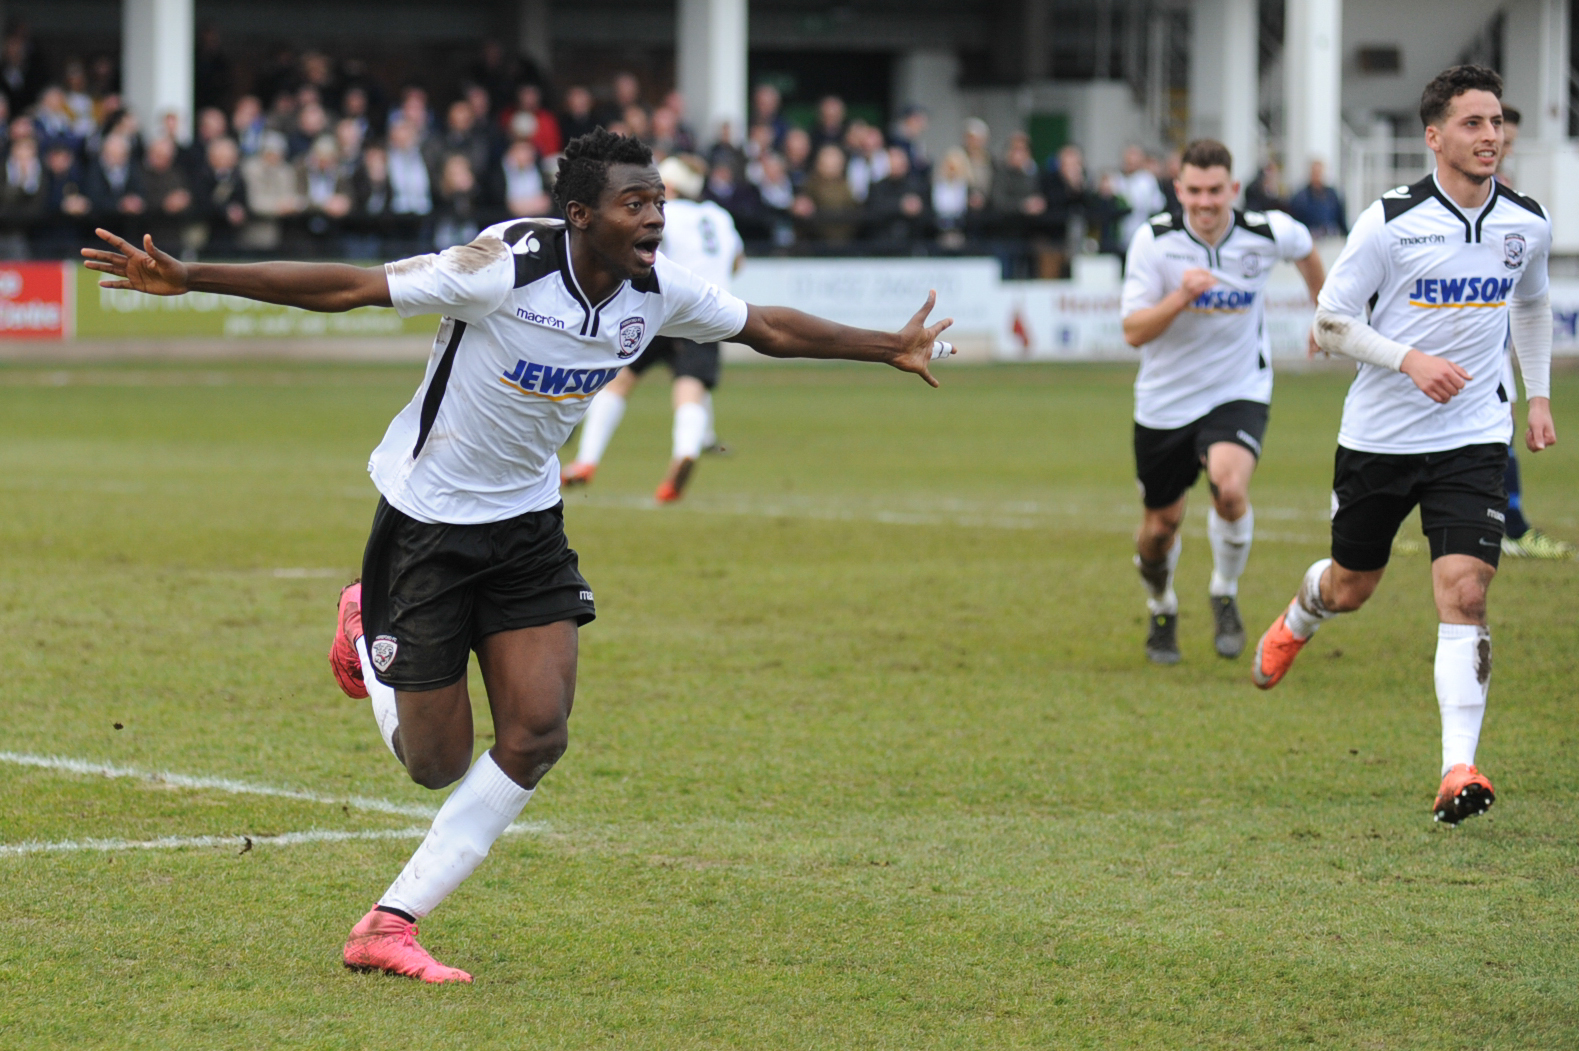 Hereford FC v Salisbury, FA Vase semi-final first leg – Mustapha Bundu scores Hereford's goal.